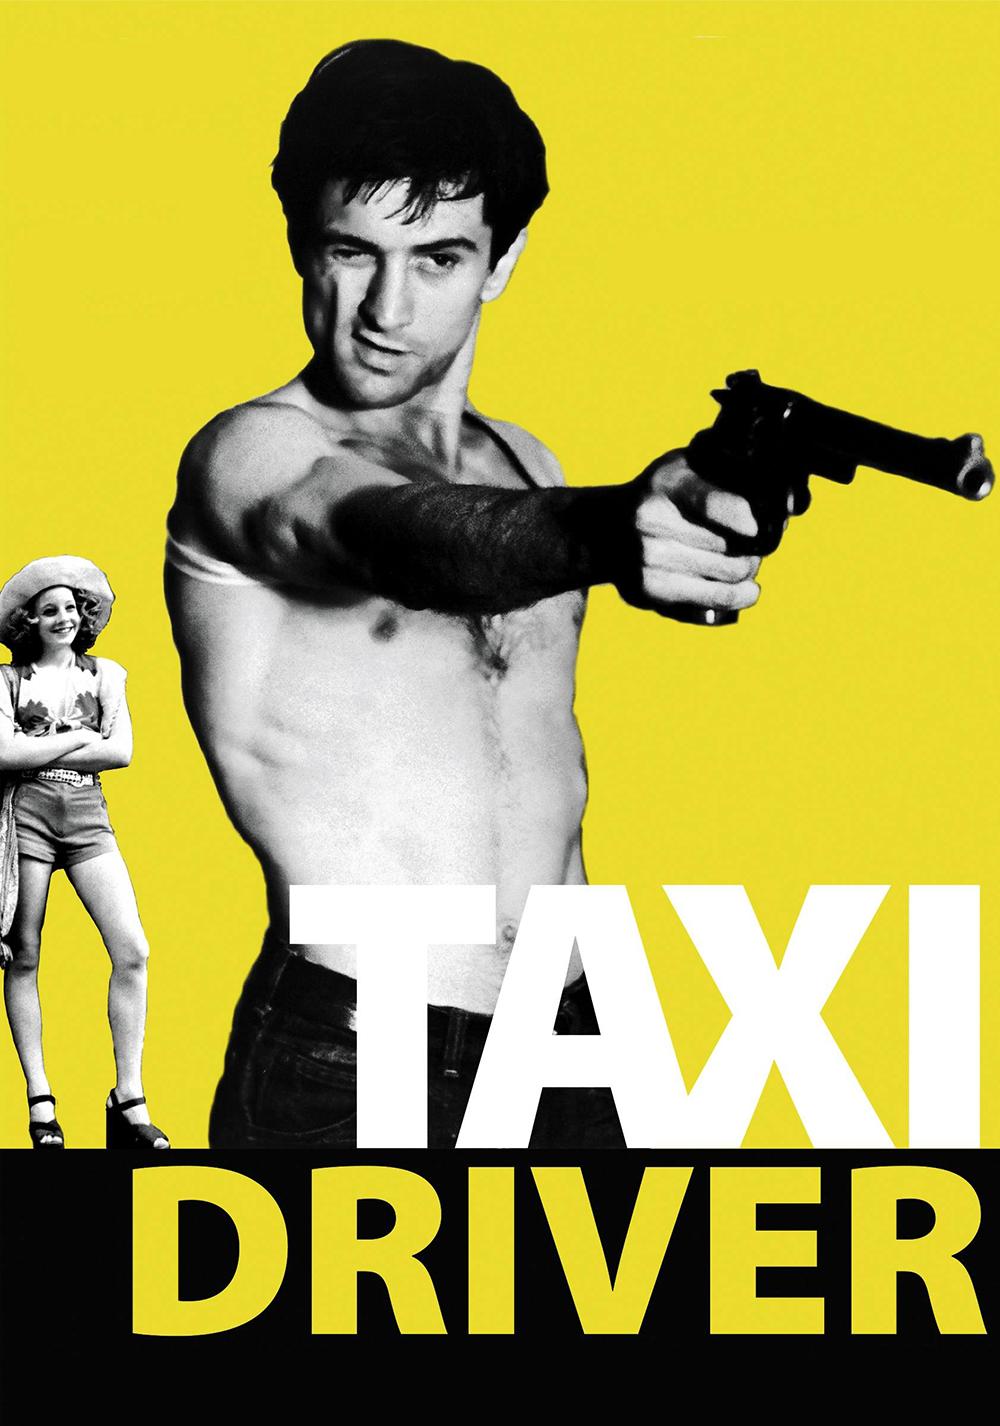 Driver Film